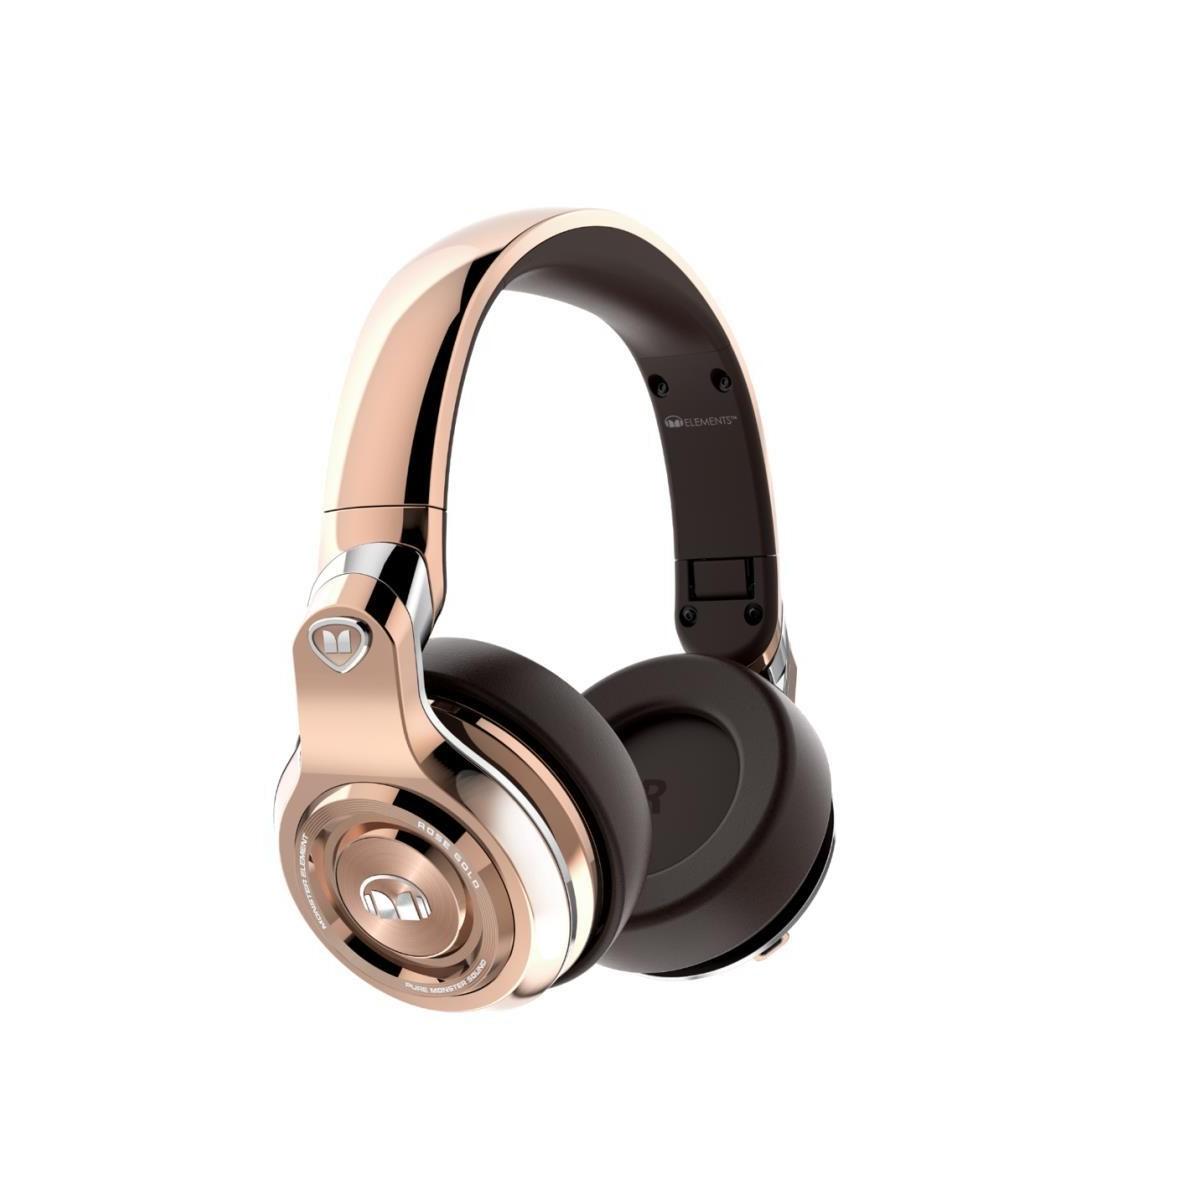 Słuchawki Bezprzewodowe ELEMENTS OVER-EAR BT GOLD MONSTER